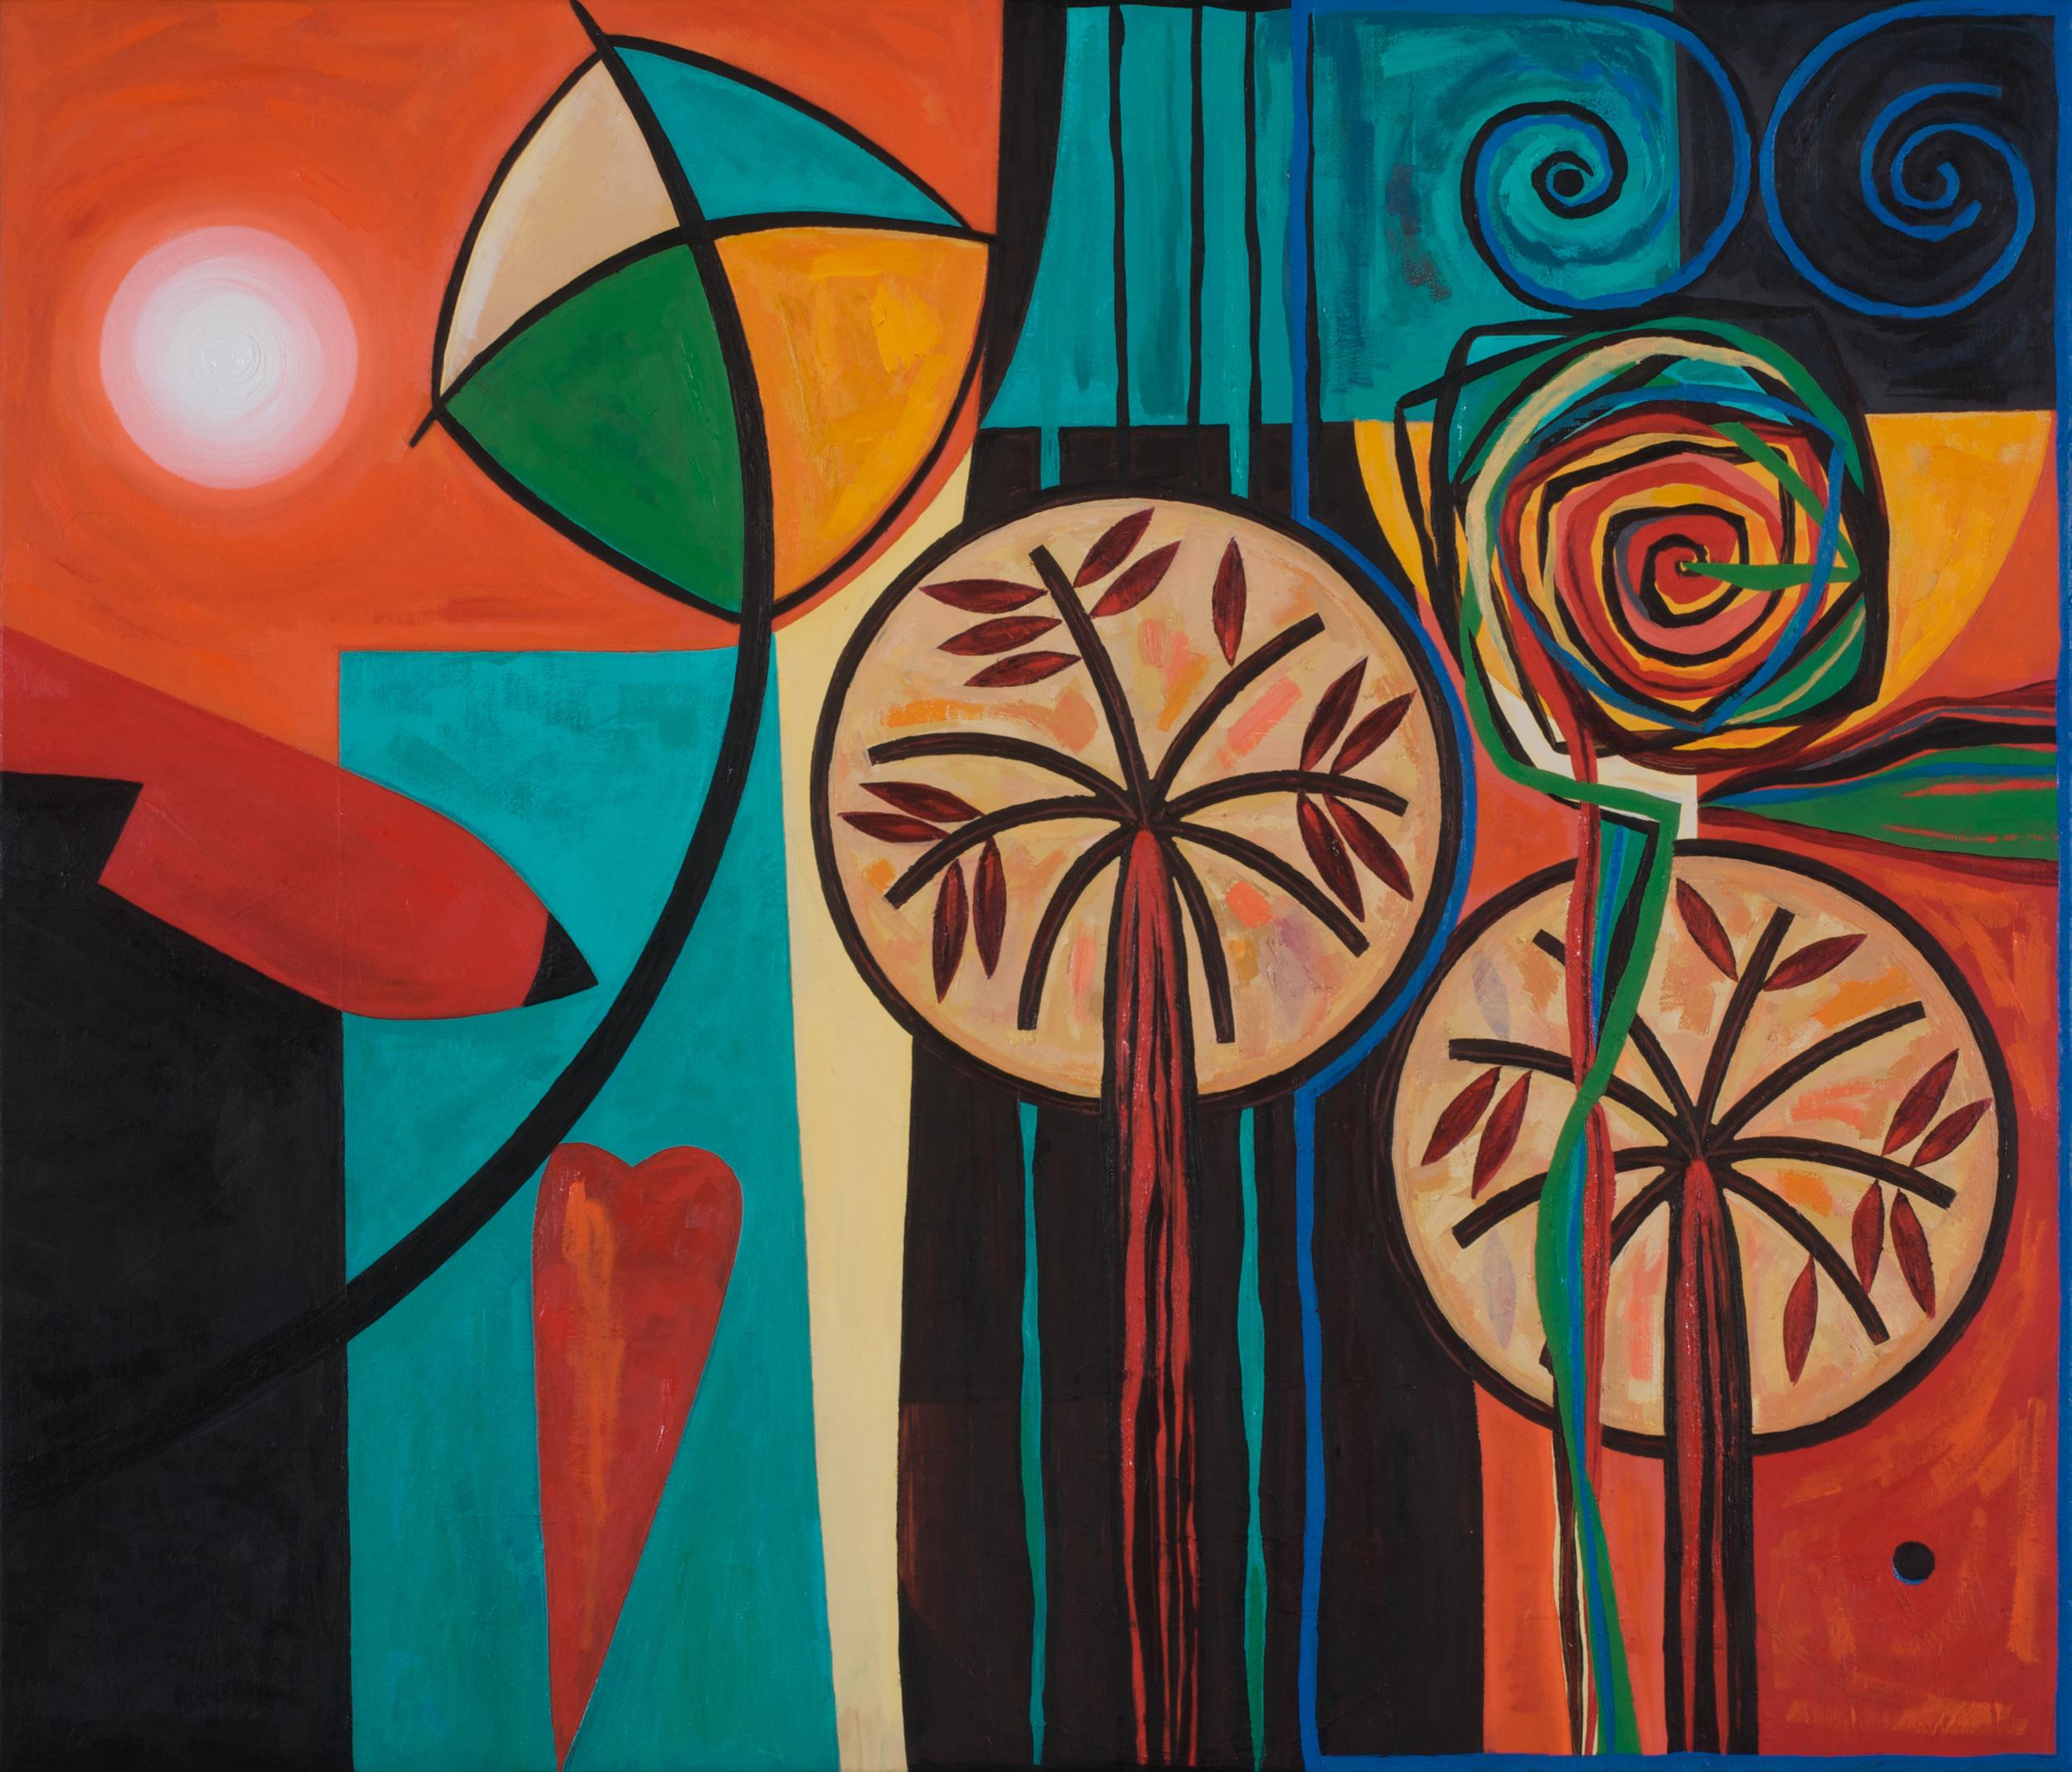 Tahira    Kites & Shattered Dreams  Oil on canvas 60x70cm 2008  Barjeel Collection  UAE